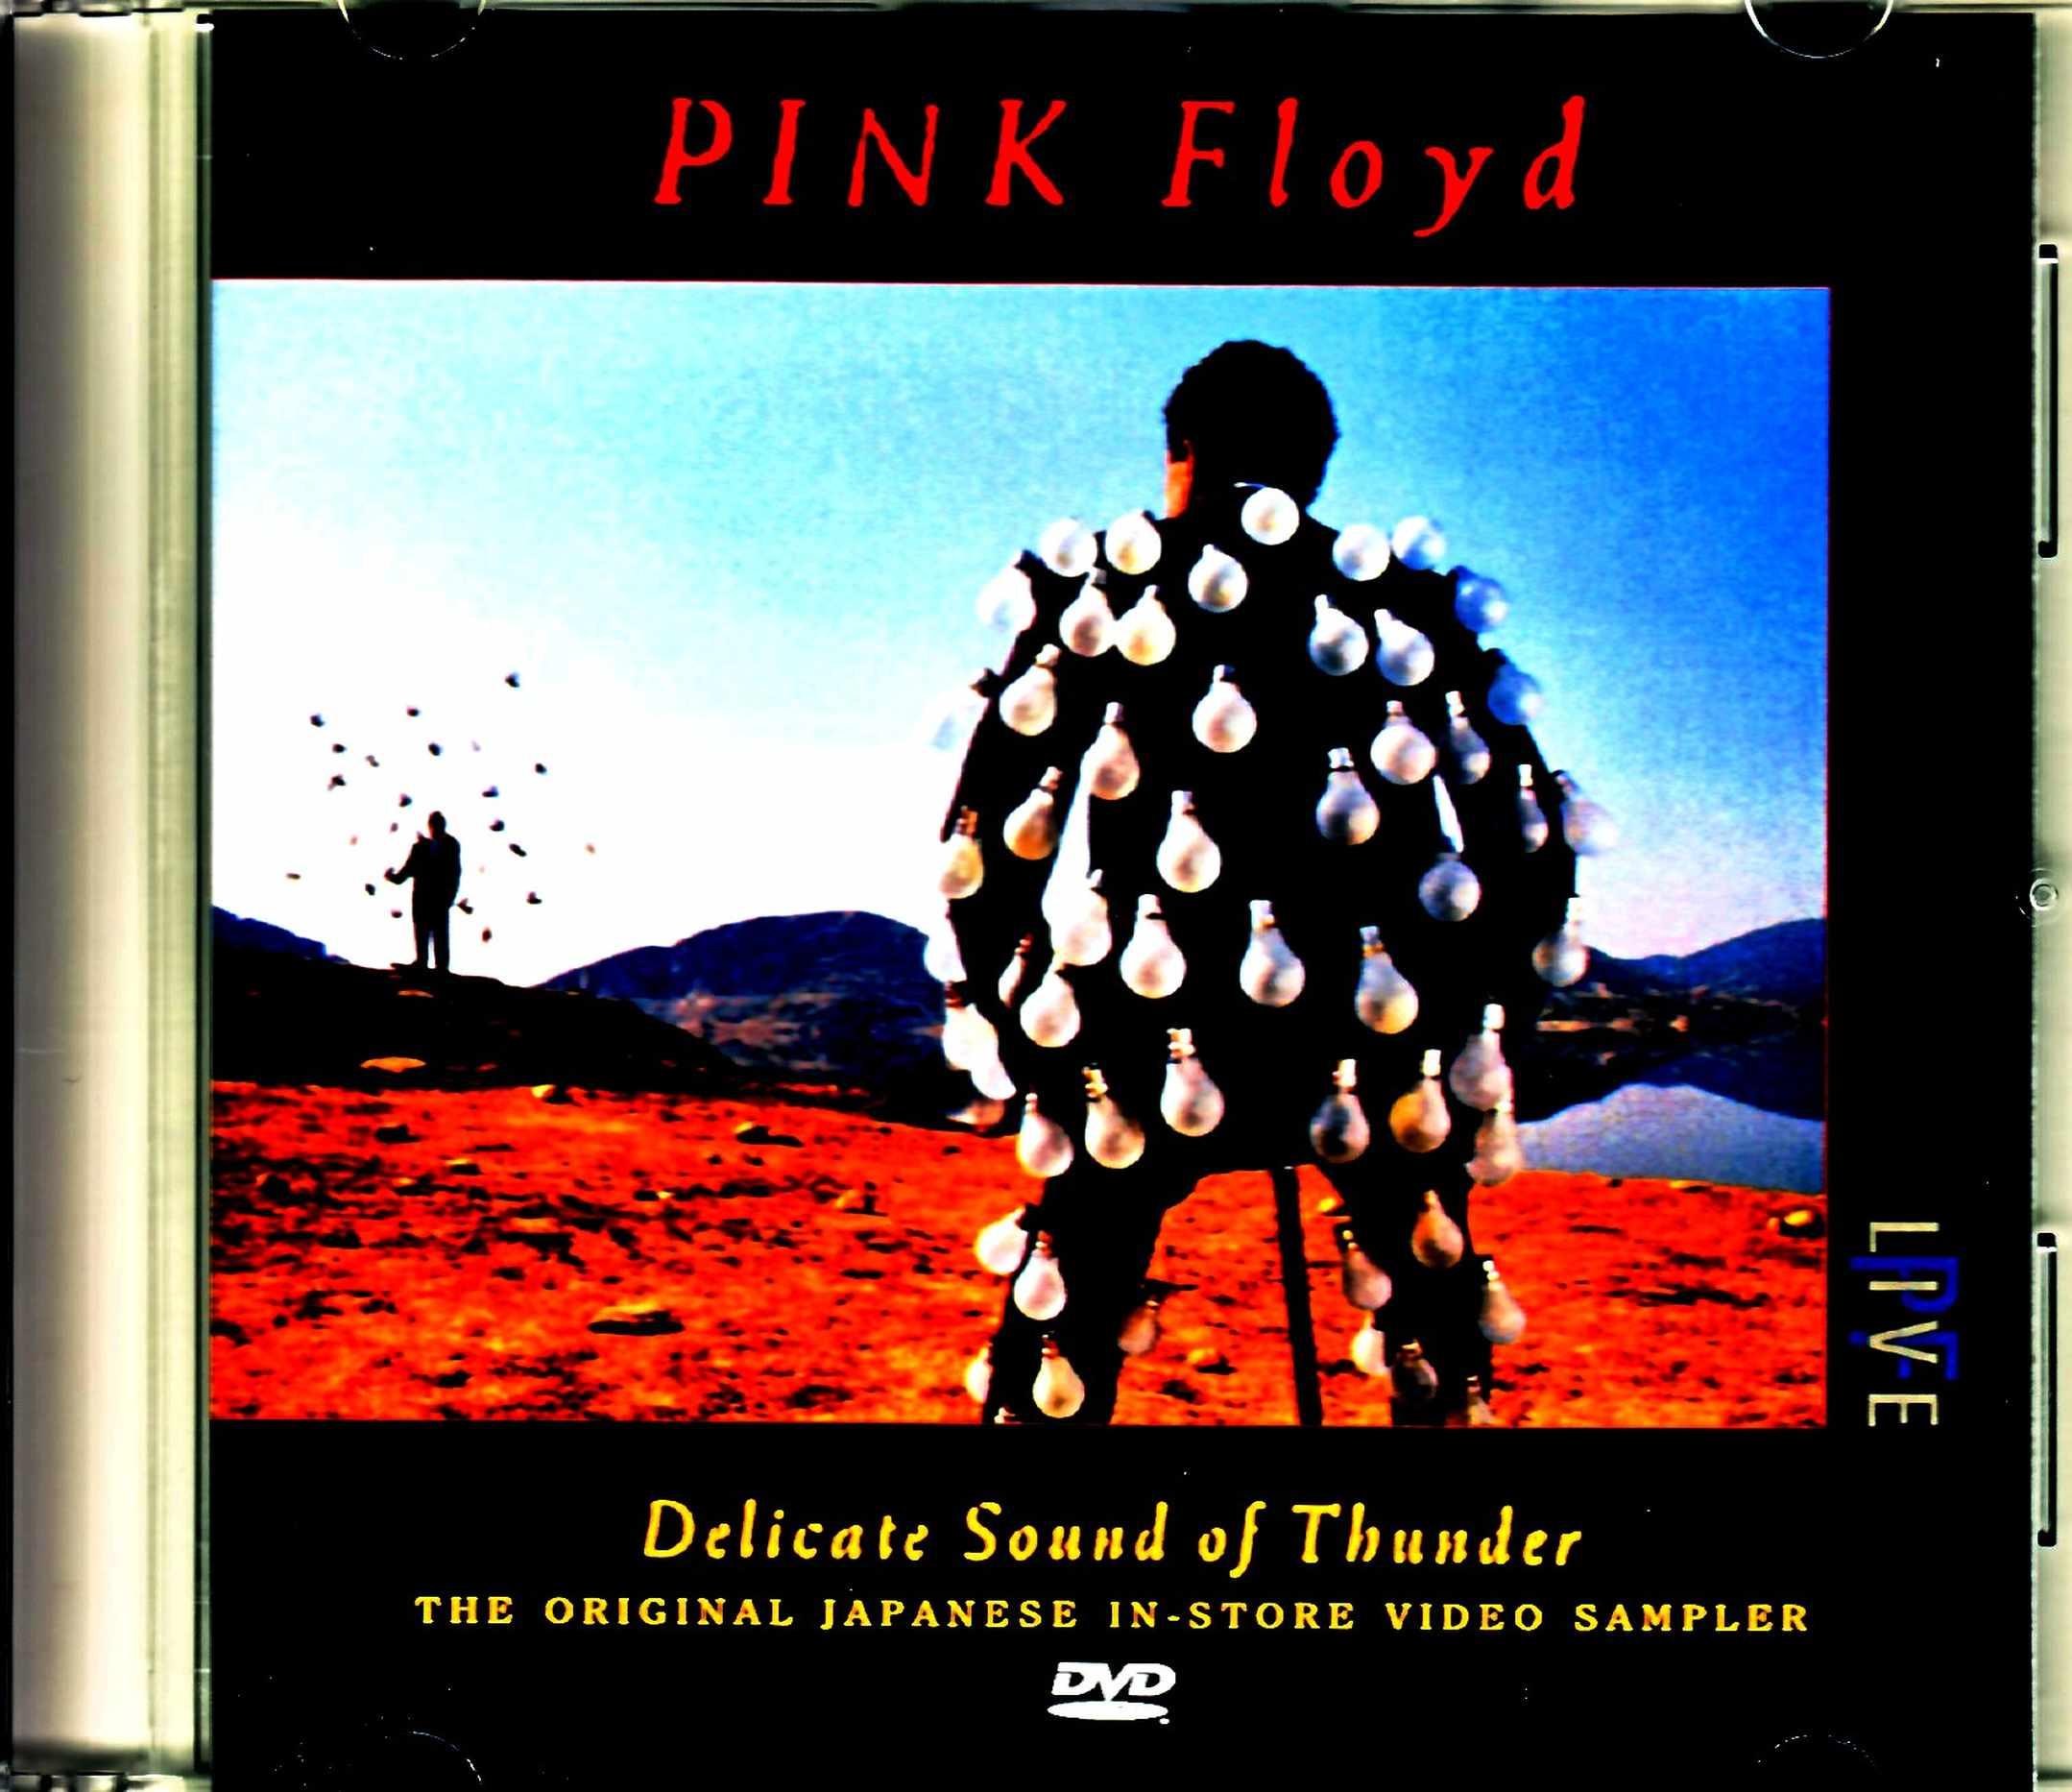 Pink Floyd ピンク・フロイド/Delicate Sound of Thunder Original Japanese in Store Video Sampler Tape